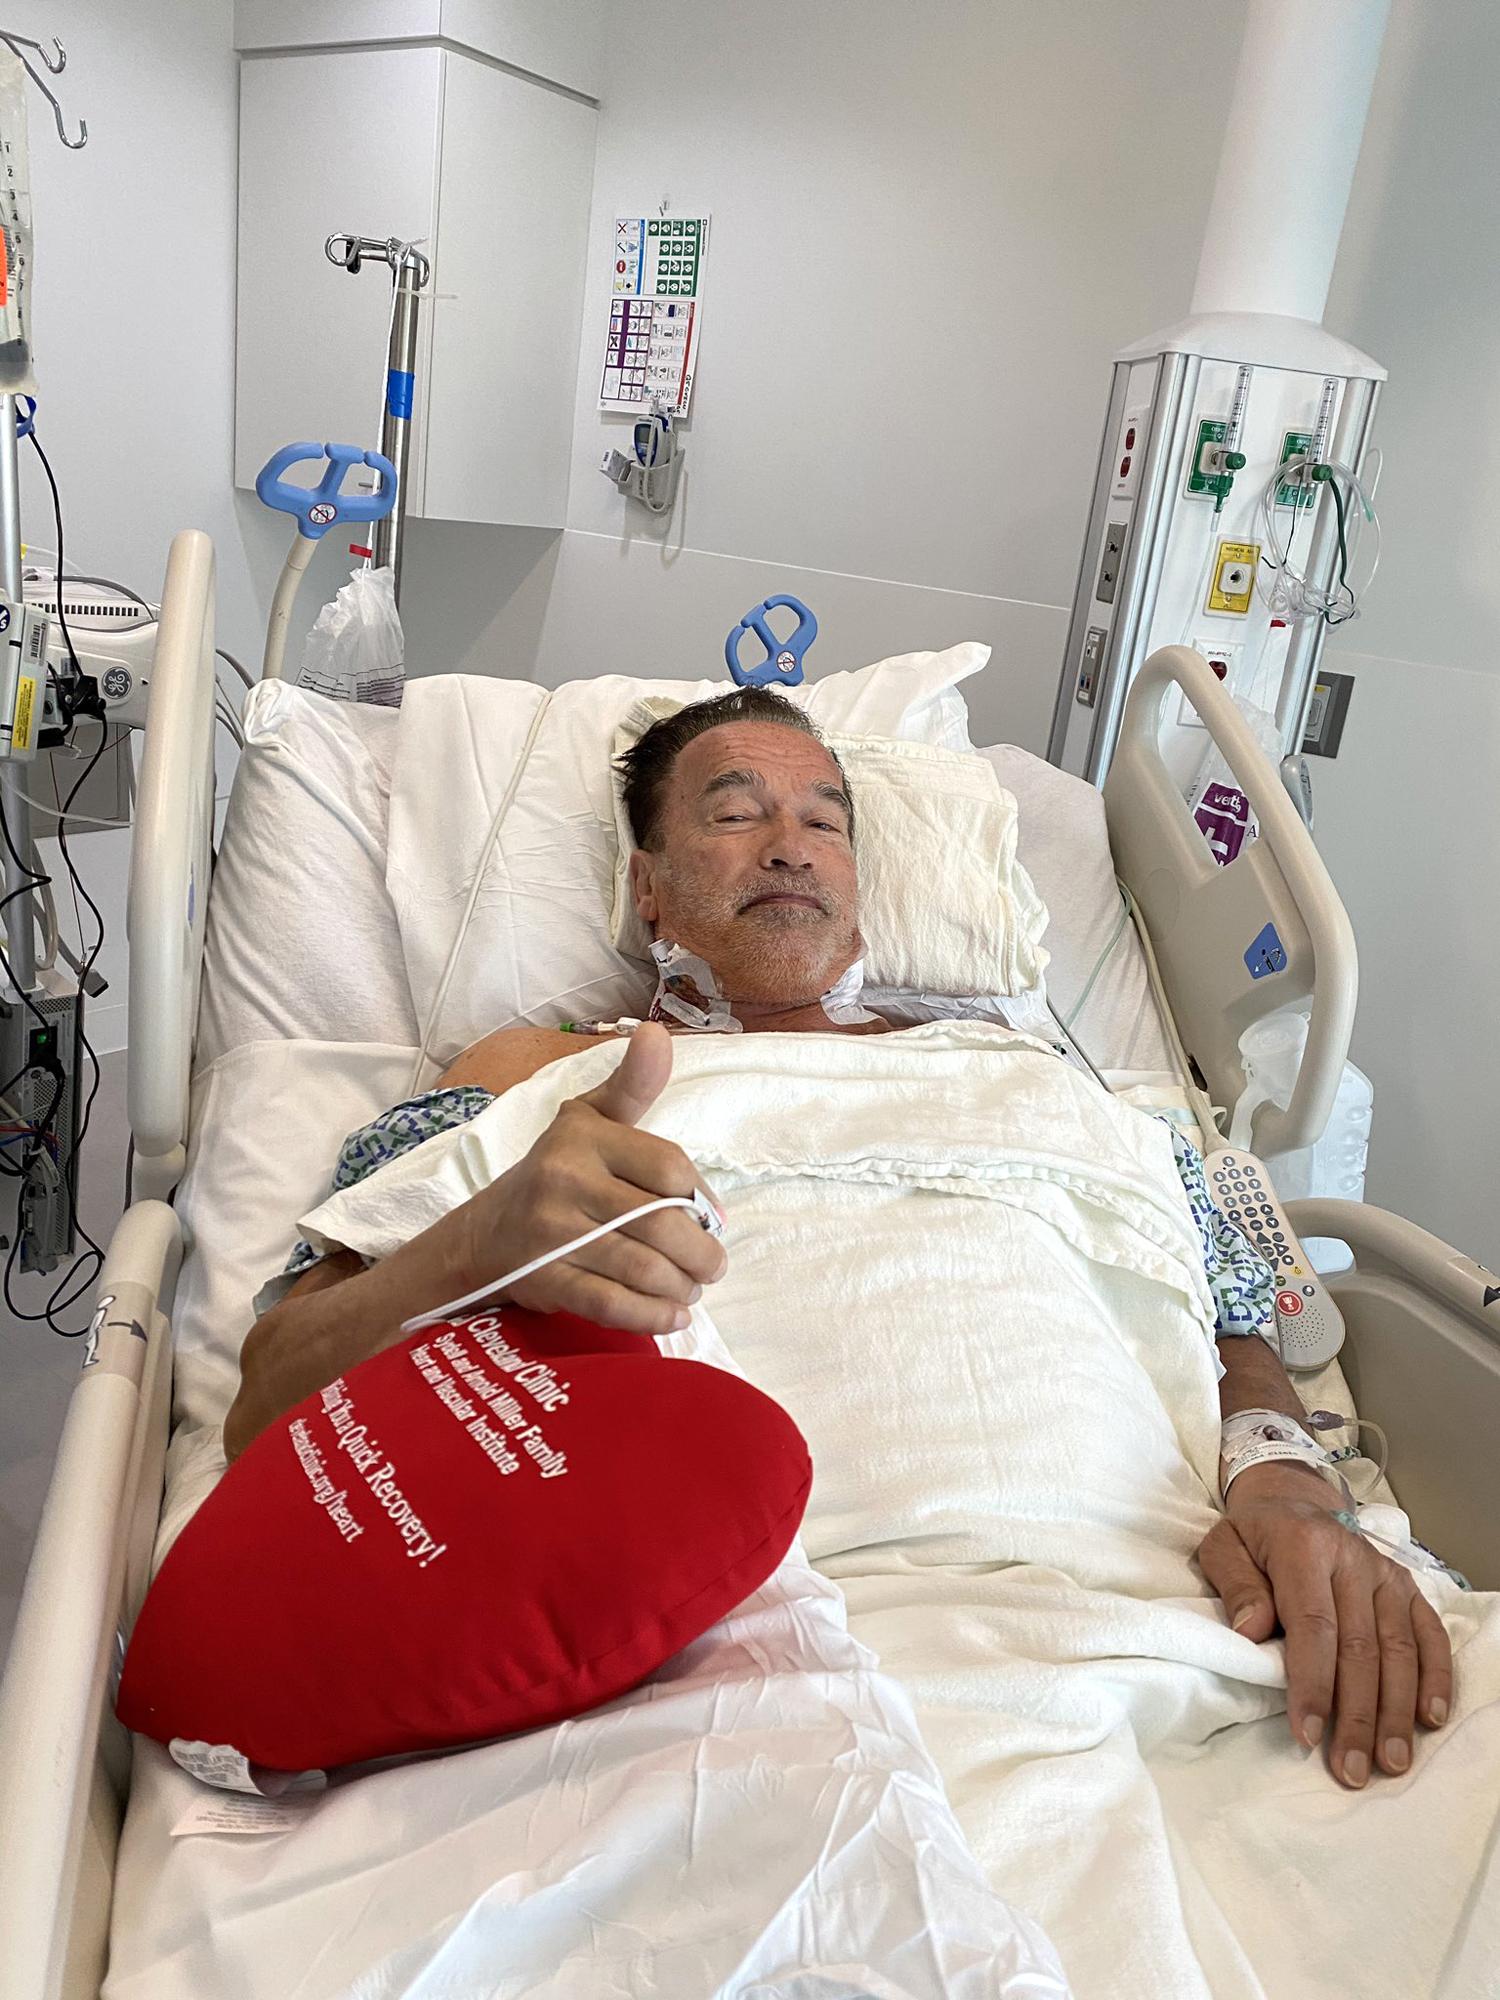 Arnold Schwarzenegger Reveals He Underwent Heart Surgery Is Recovering